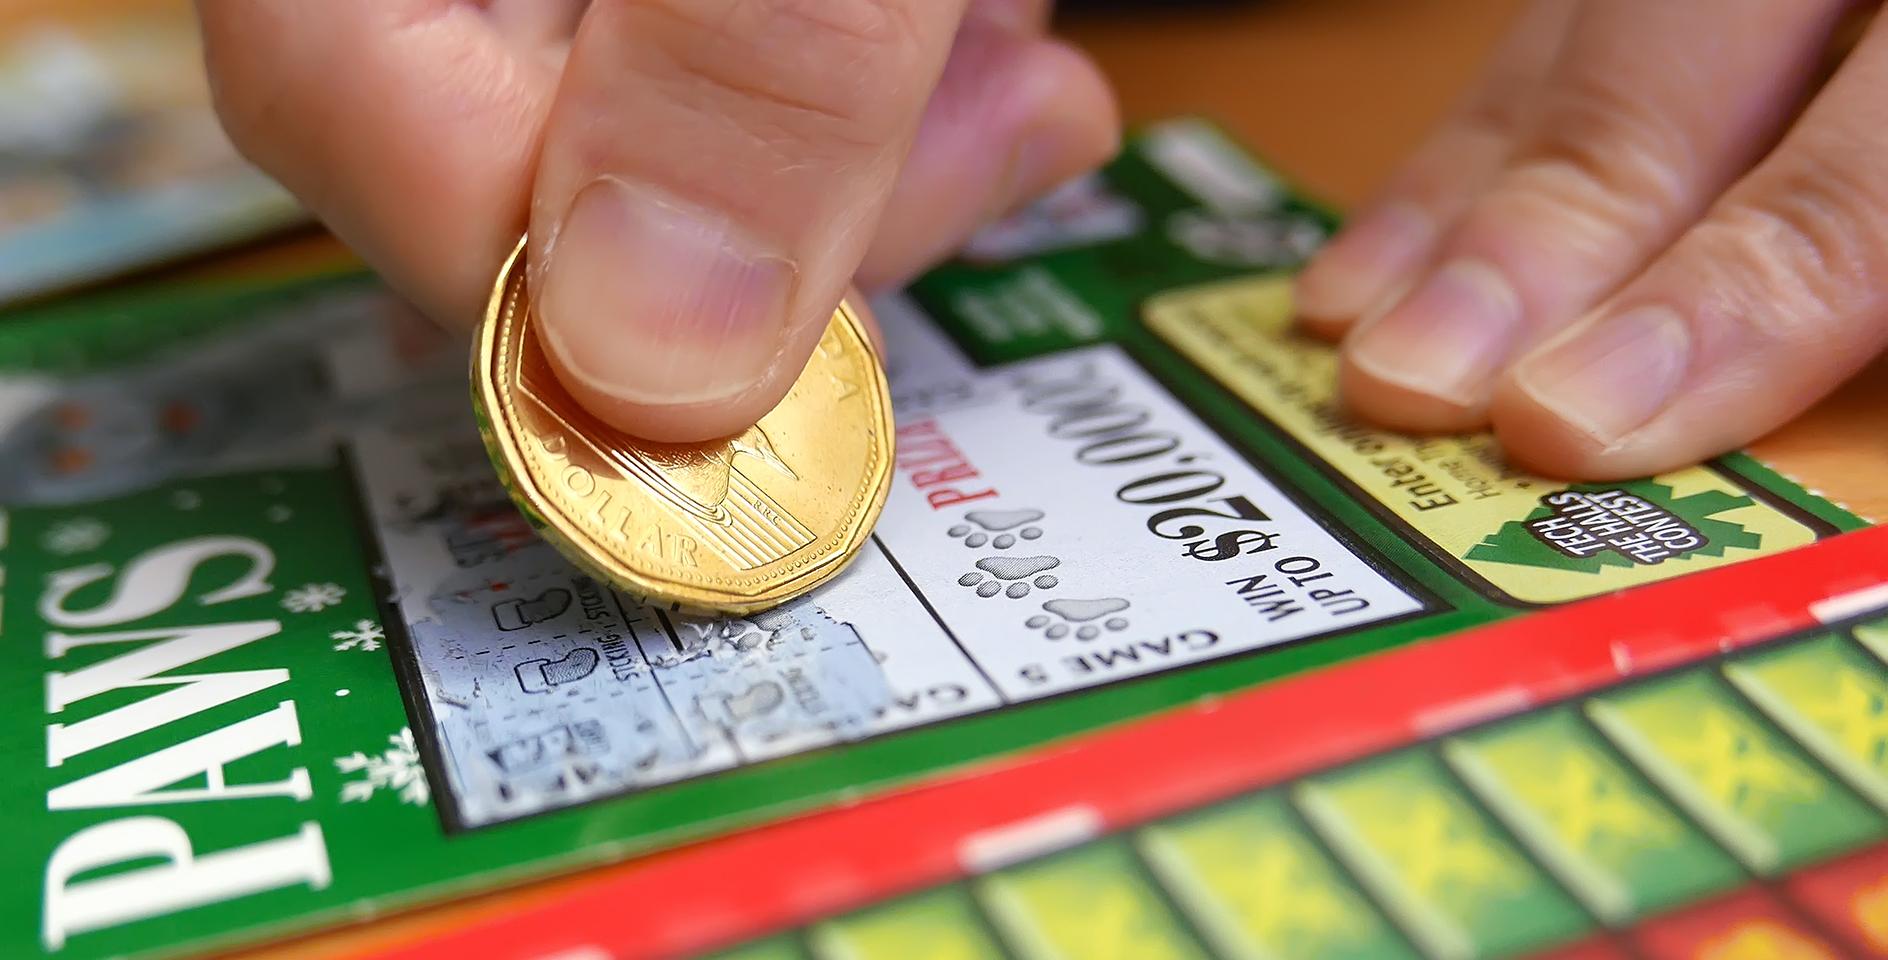 Prediksi Togel Jitu - Play Gambling with Advanced Technology - Betting Guide